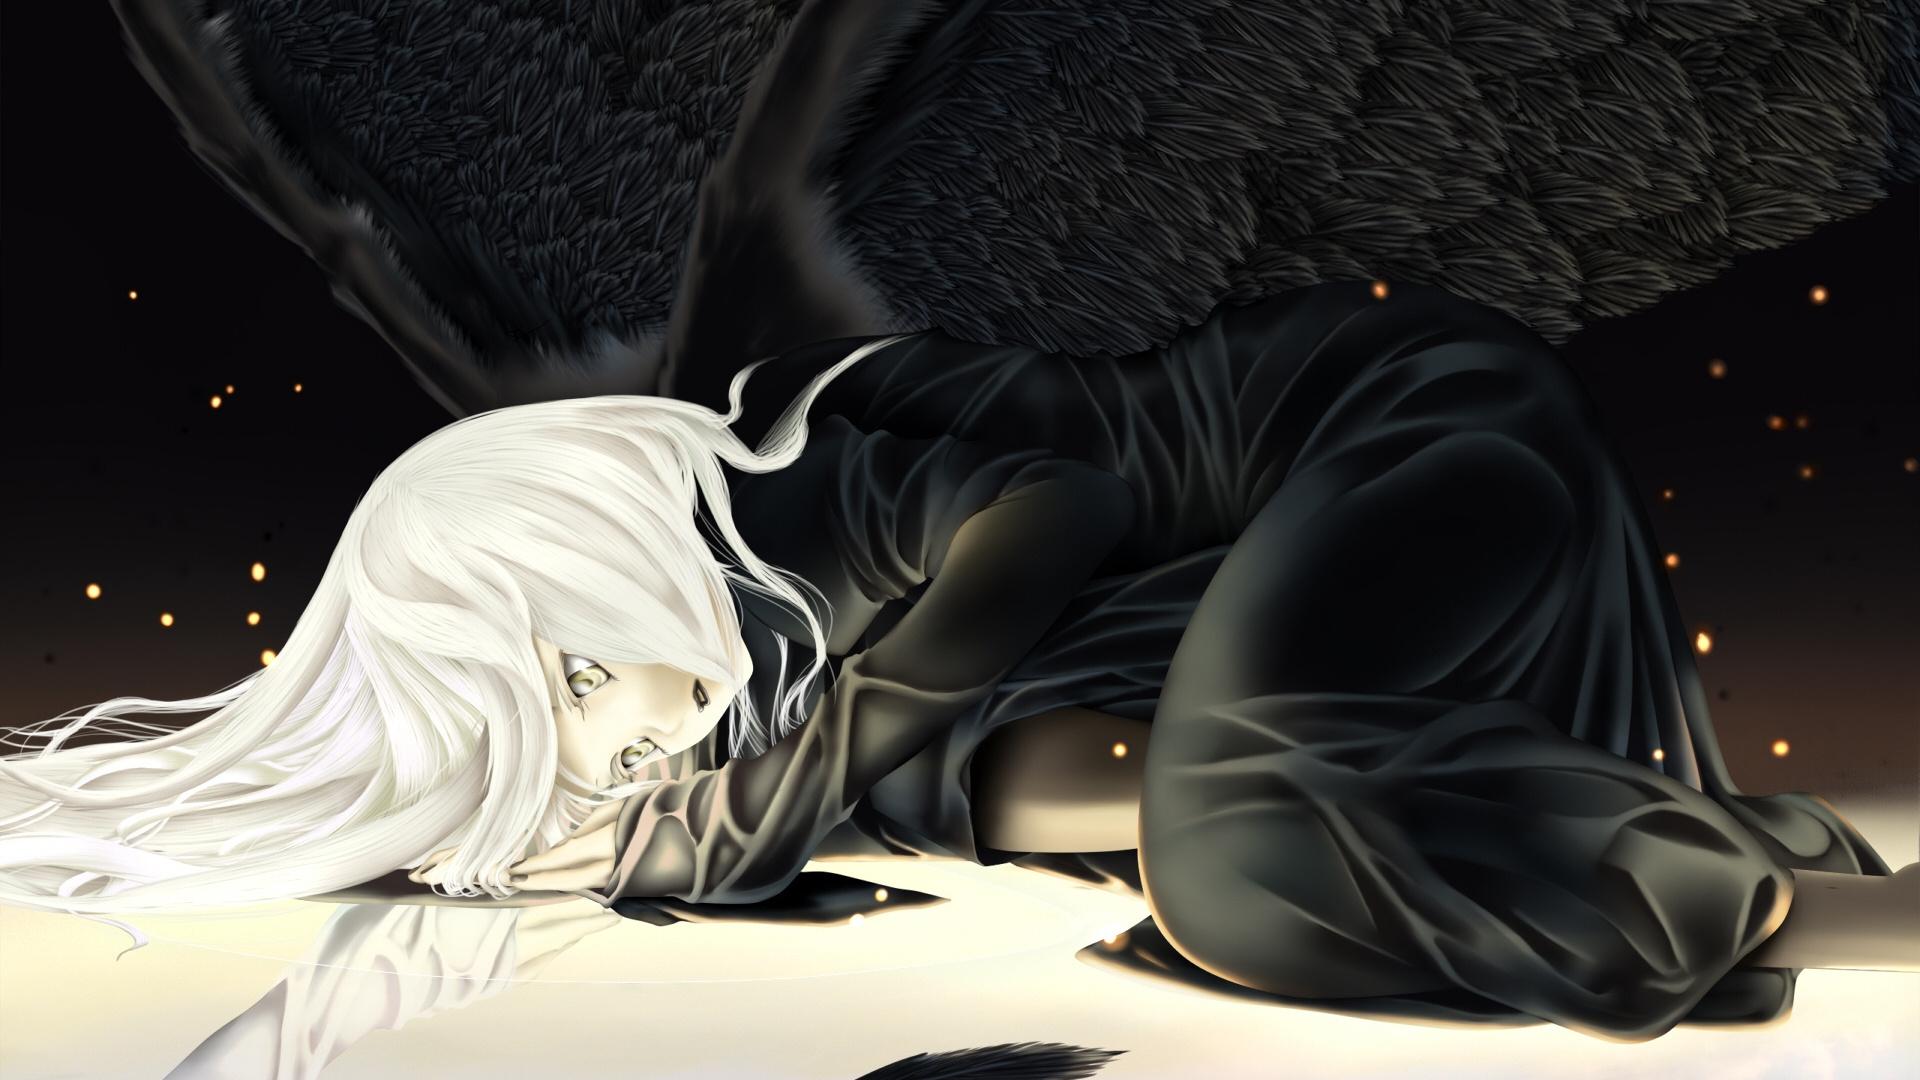 Wallpaper Anime Girl Blond Wing Sadness Darkness 1920x1080